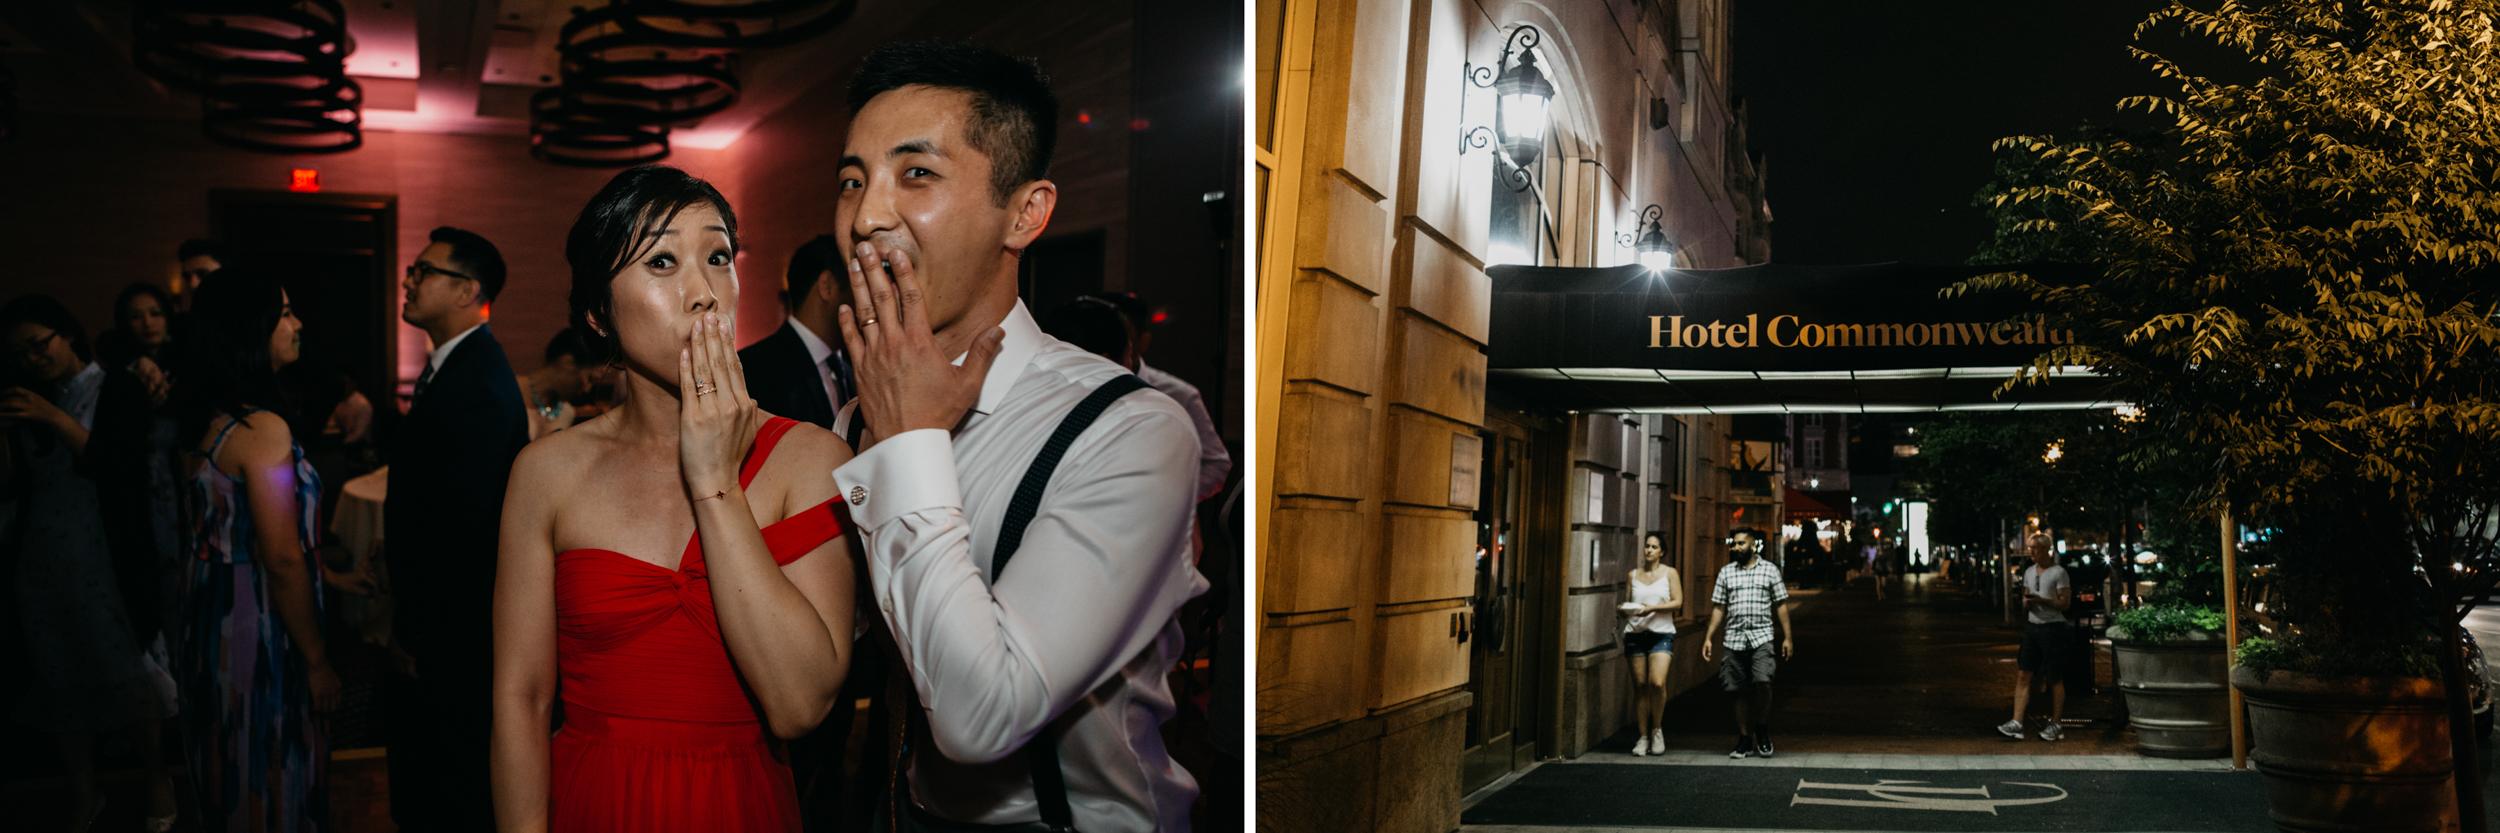 Mindy_Bo_Boston_Wedding_MIT_HotelCommonwealth_035.jpg